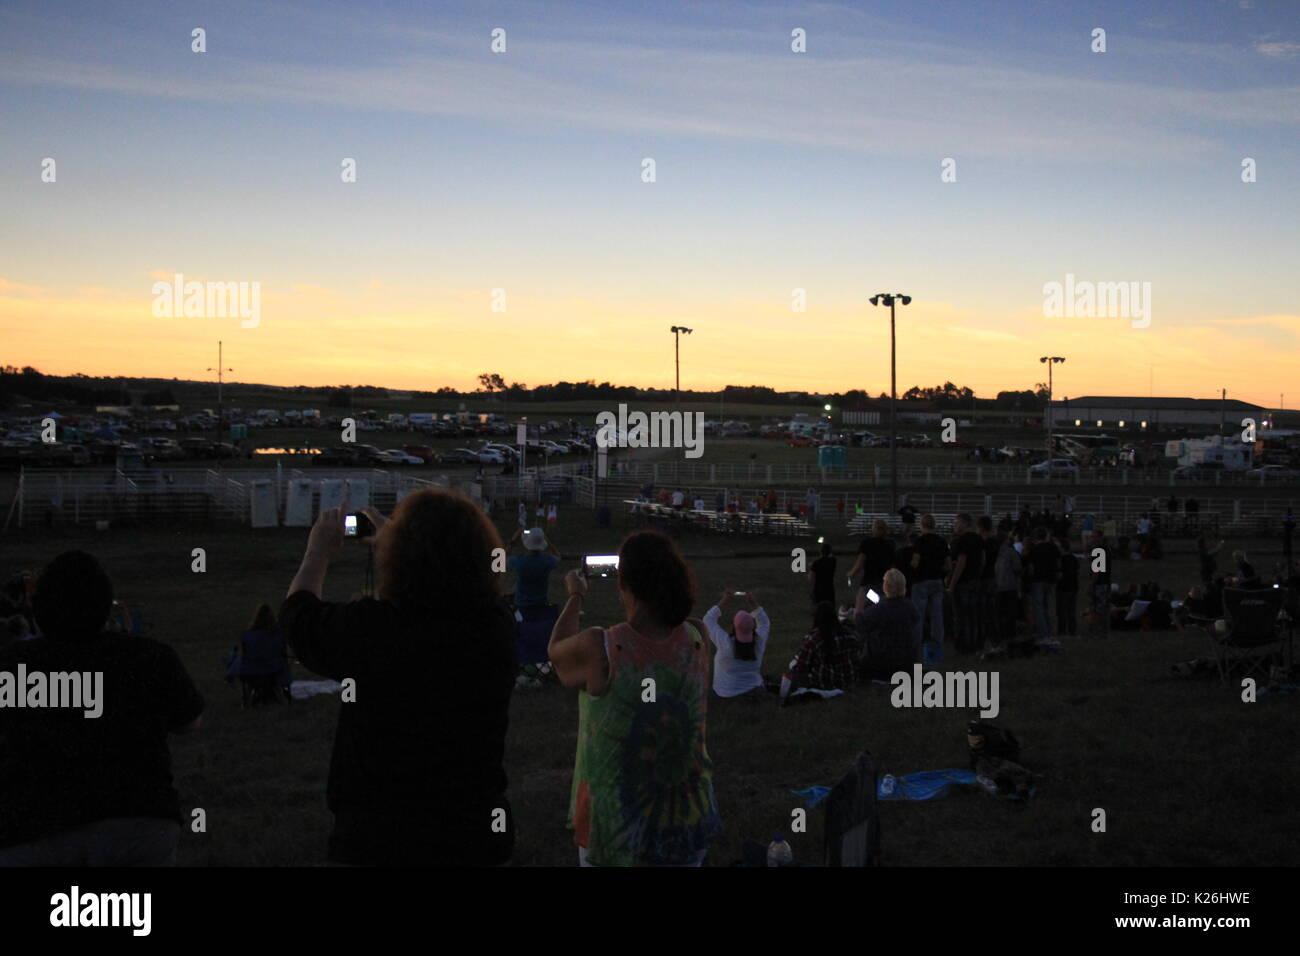 Solar Eclipse at Stapleton, Nebraska Stock Photo